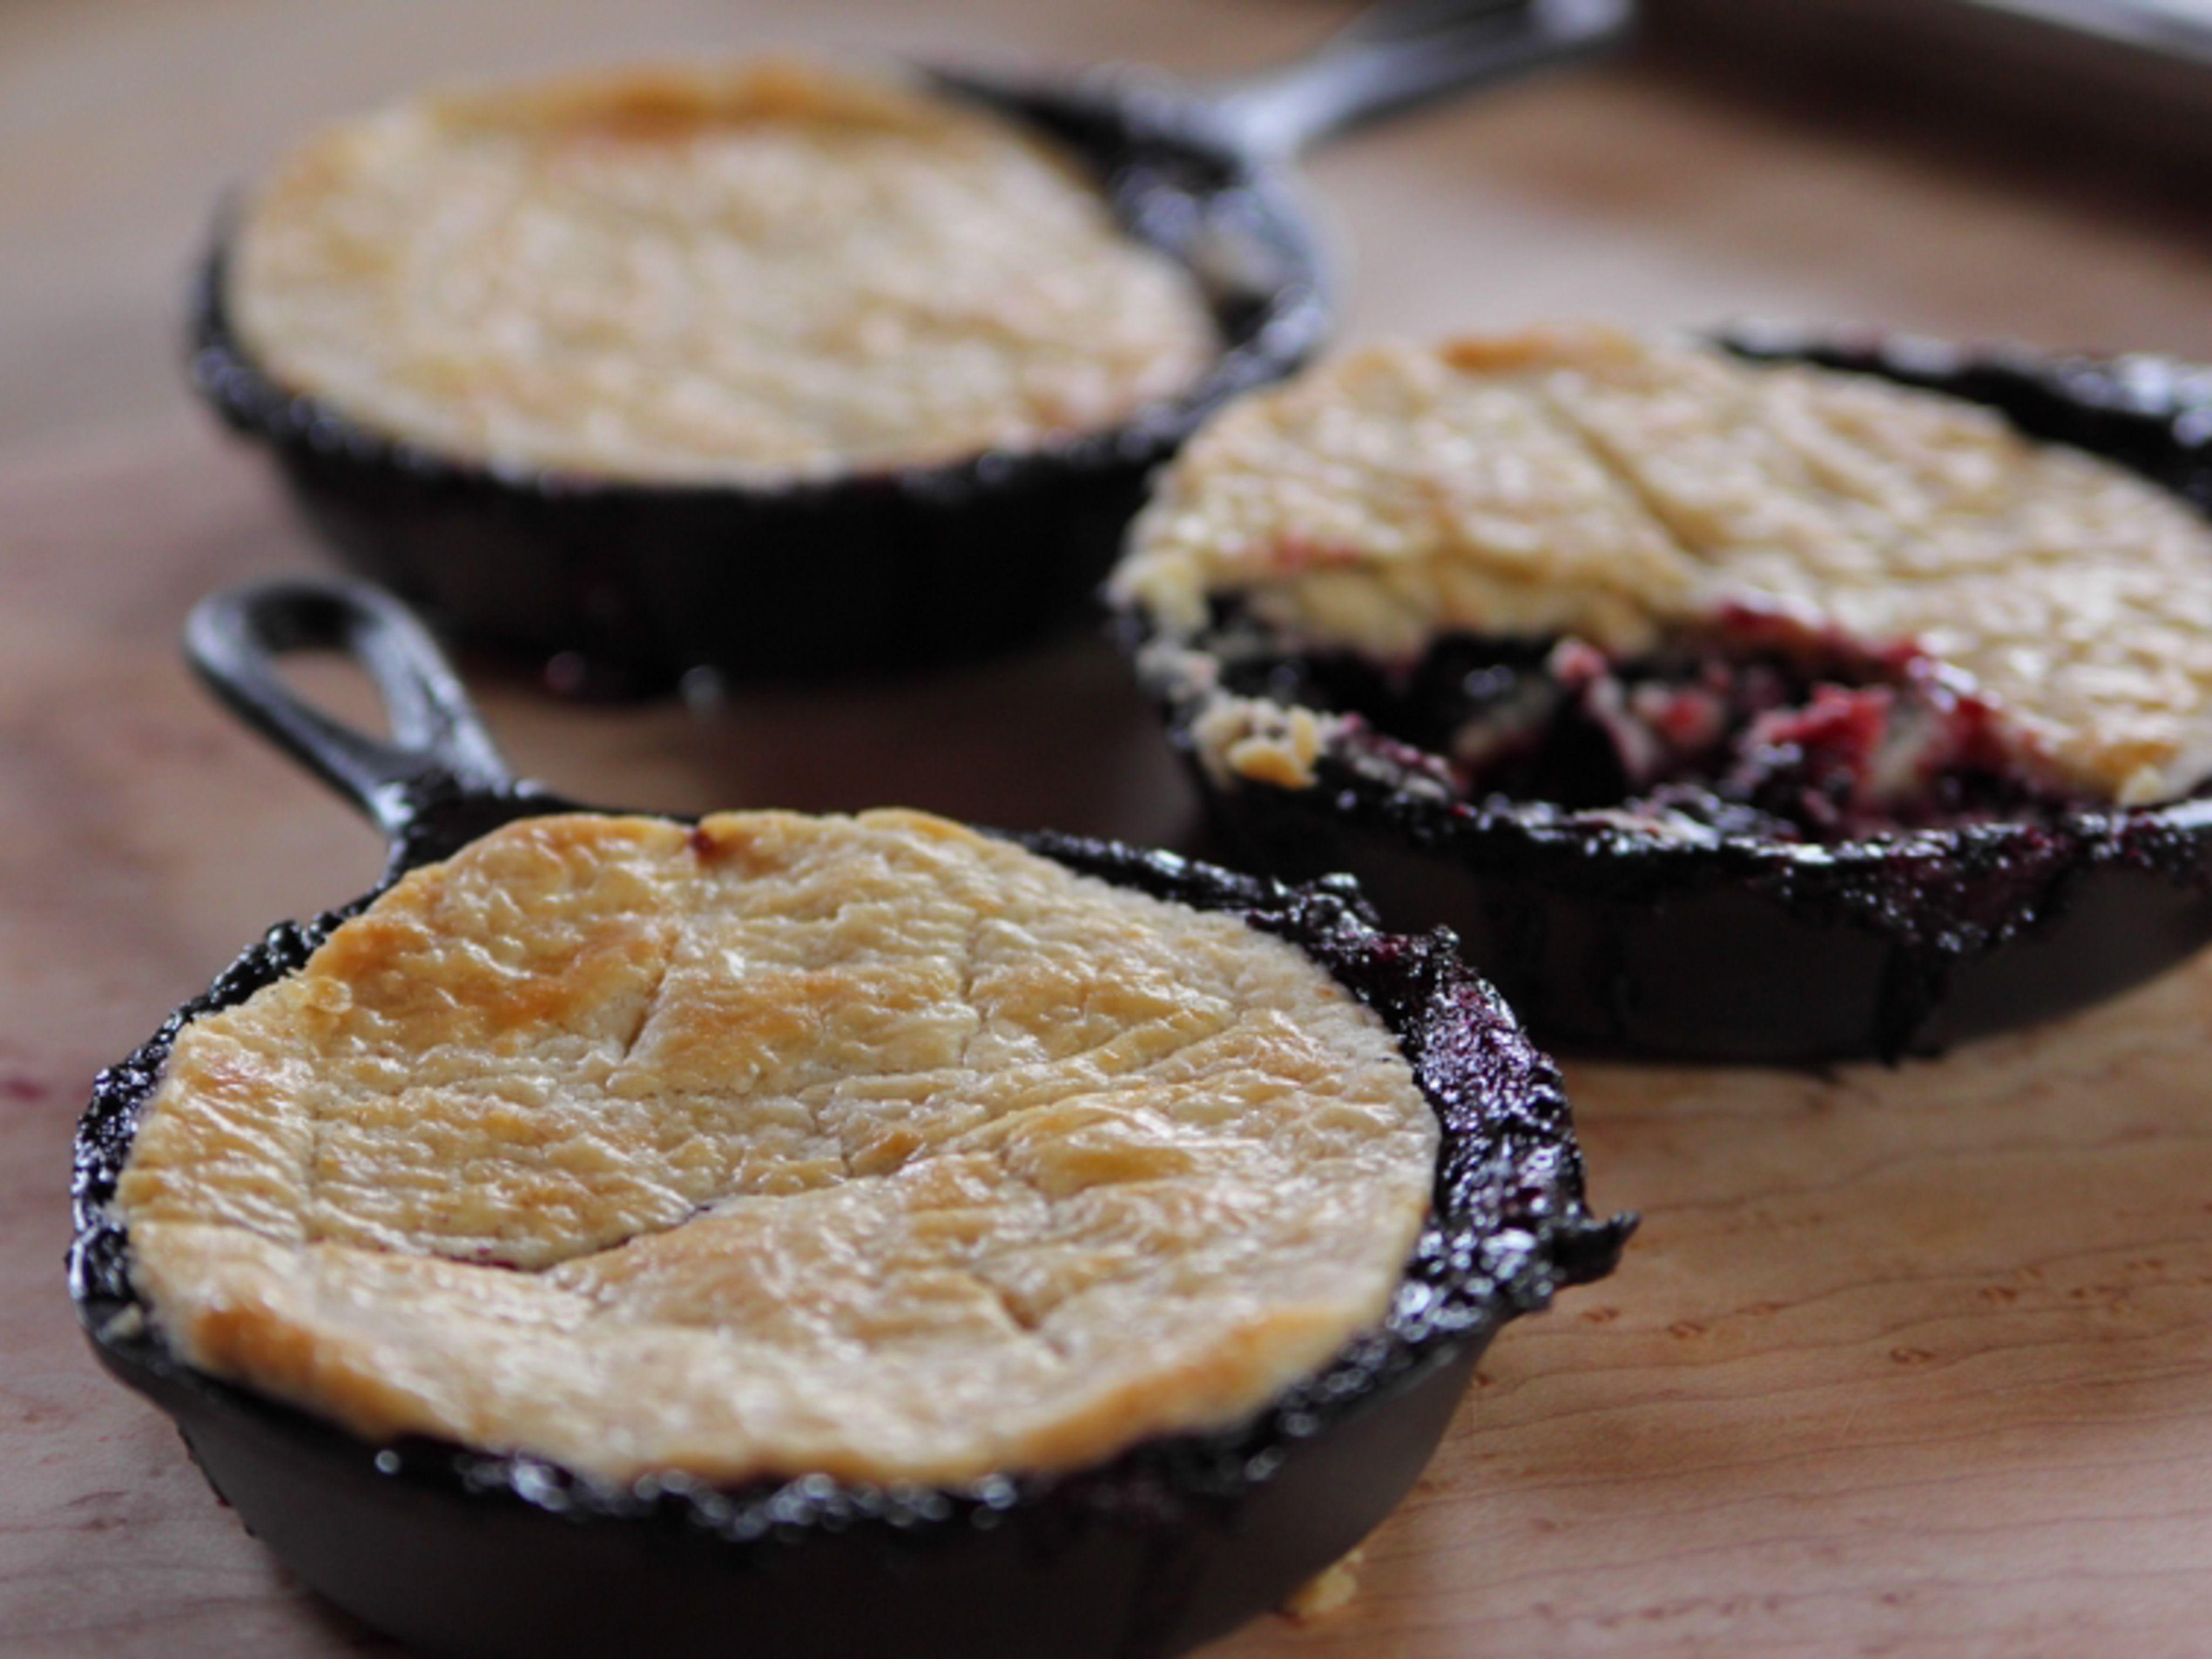 Blackberry pot pies recipe pot pies blackberry and pioneer woman blackberry pot pies forumfinder Images